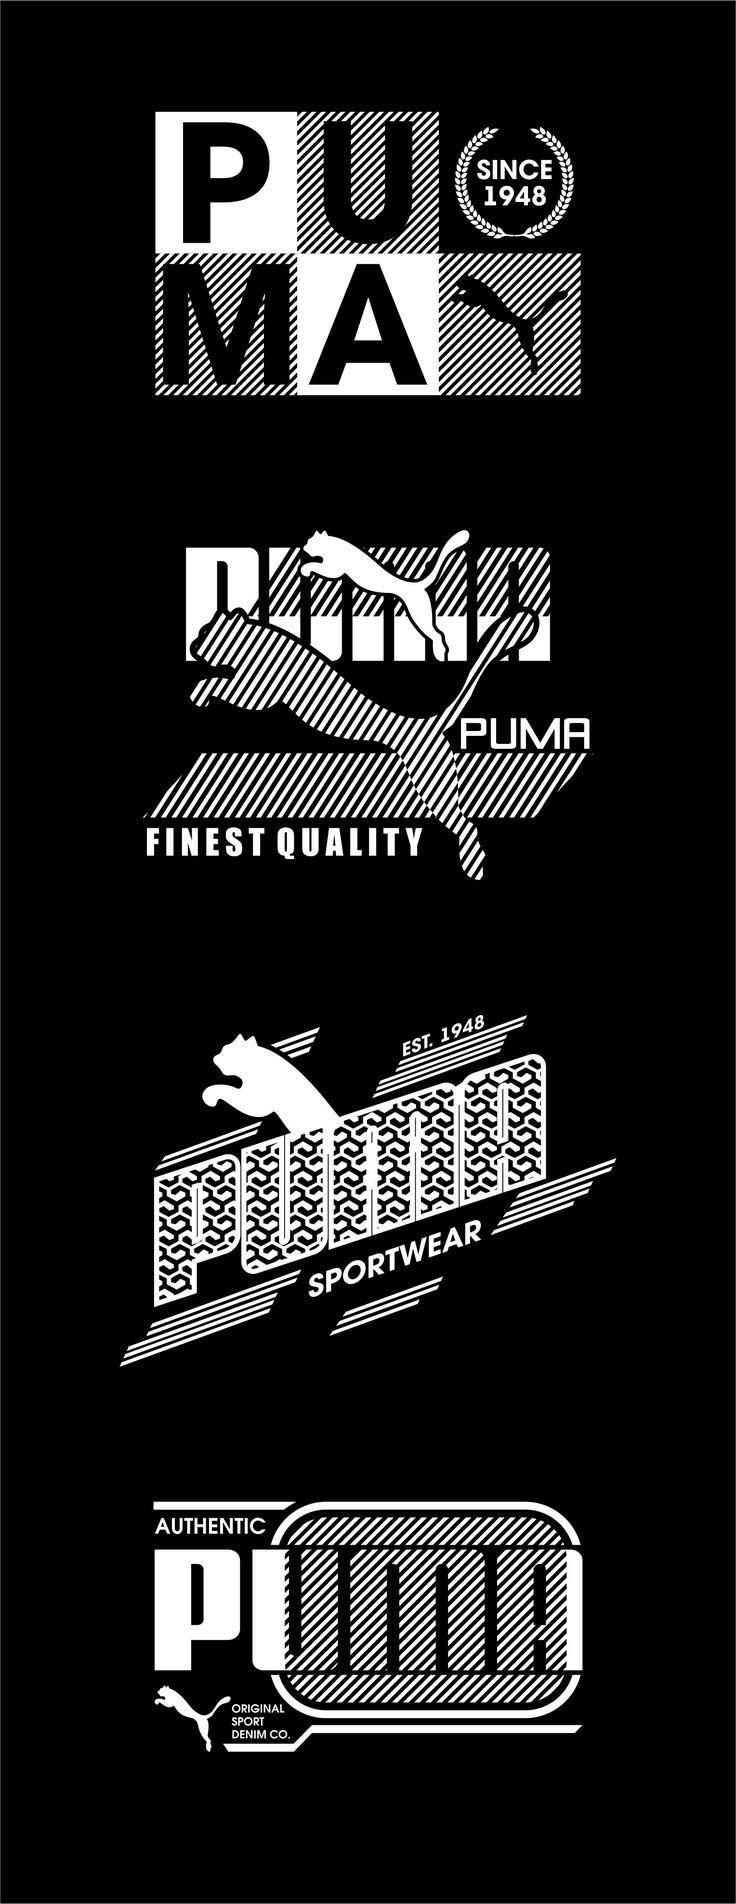 Vintage Vector puma #vintage #vector #vectorsurf #vintagevector #volcom #adidas #billabong #rusty #nike #puma #levis #quiksilver #ripcurl #dc #vans #spyderbilt #reebok